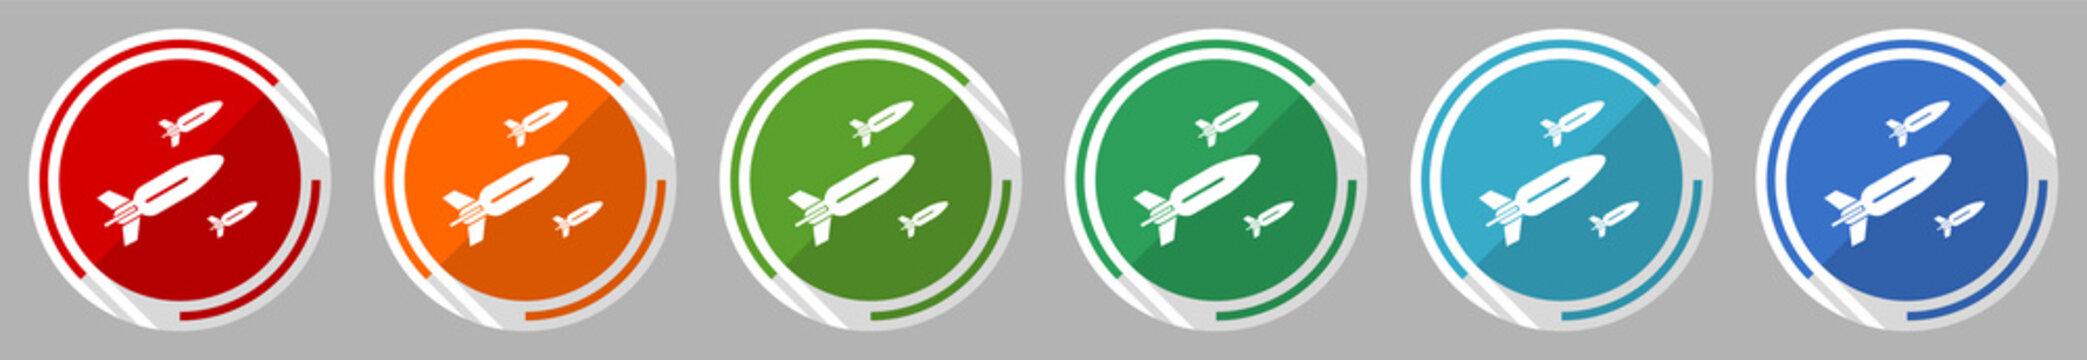 Missile, rocket, weapon, war icon set, vector illustration in 6 colors options for webdesign and mobile applications, flat design symbol